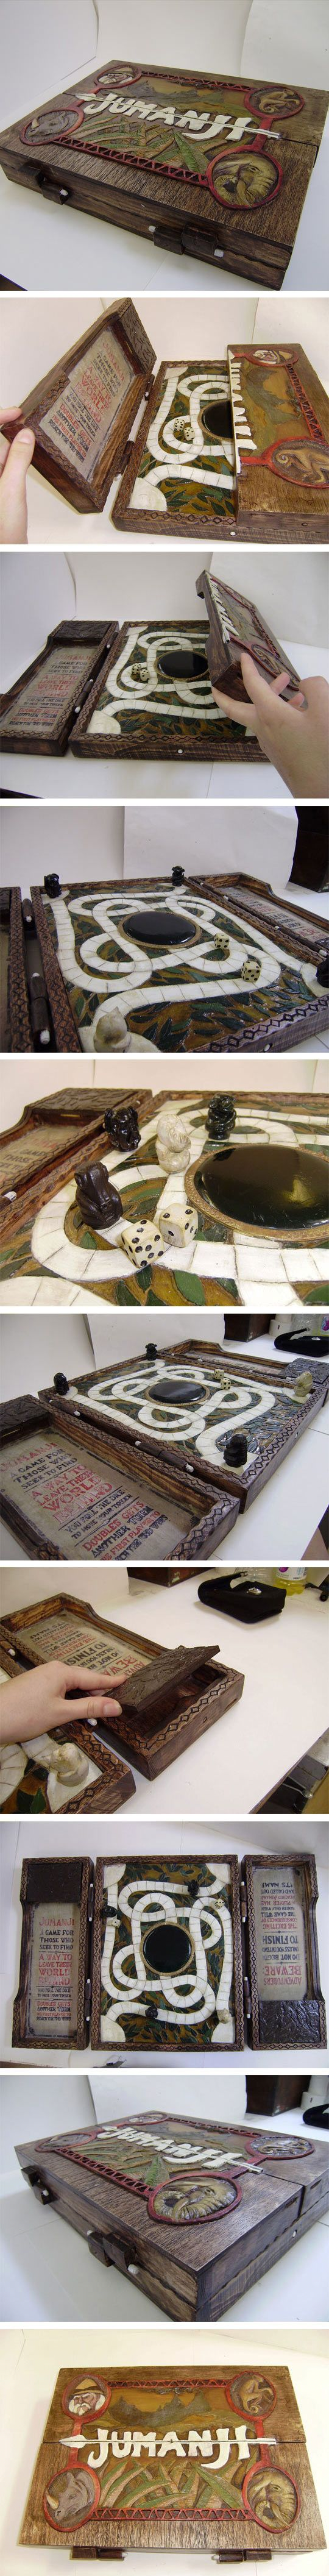 Handmade Jumanji Game Box